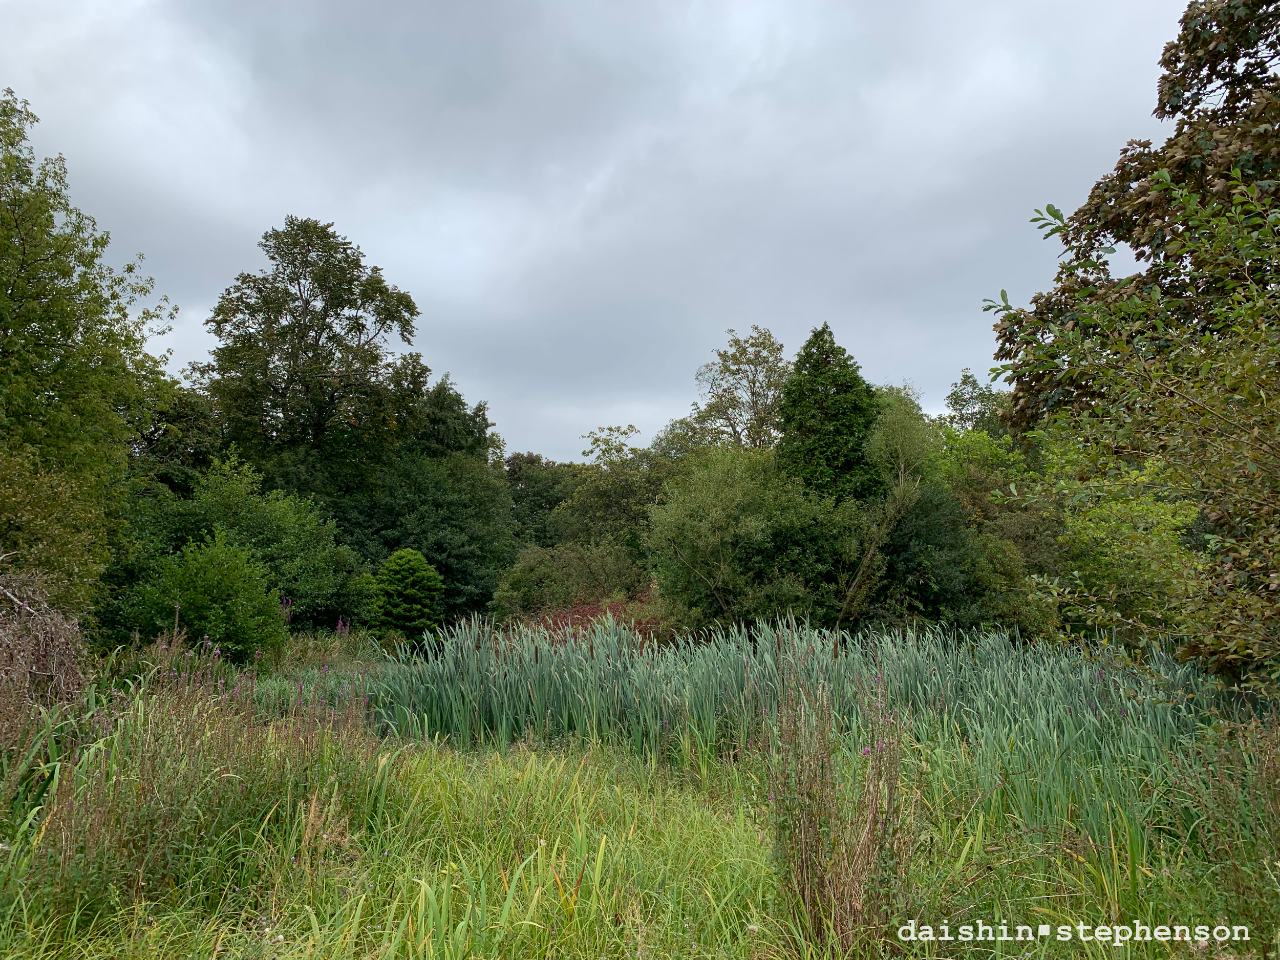 greenery surrounding kelvin park duckpond